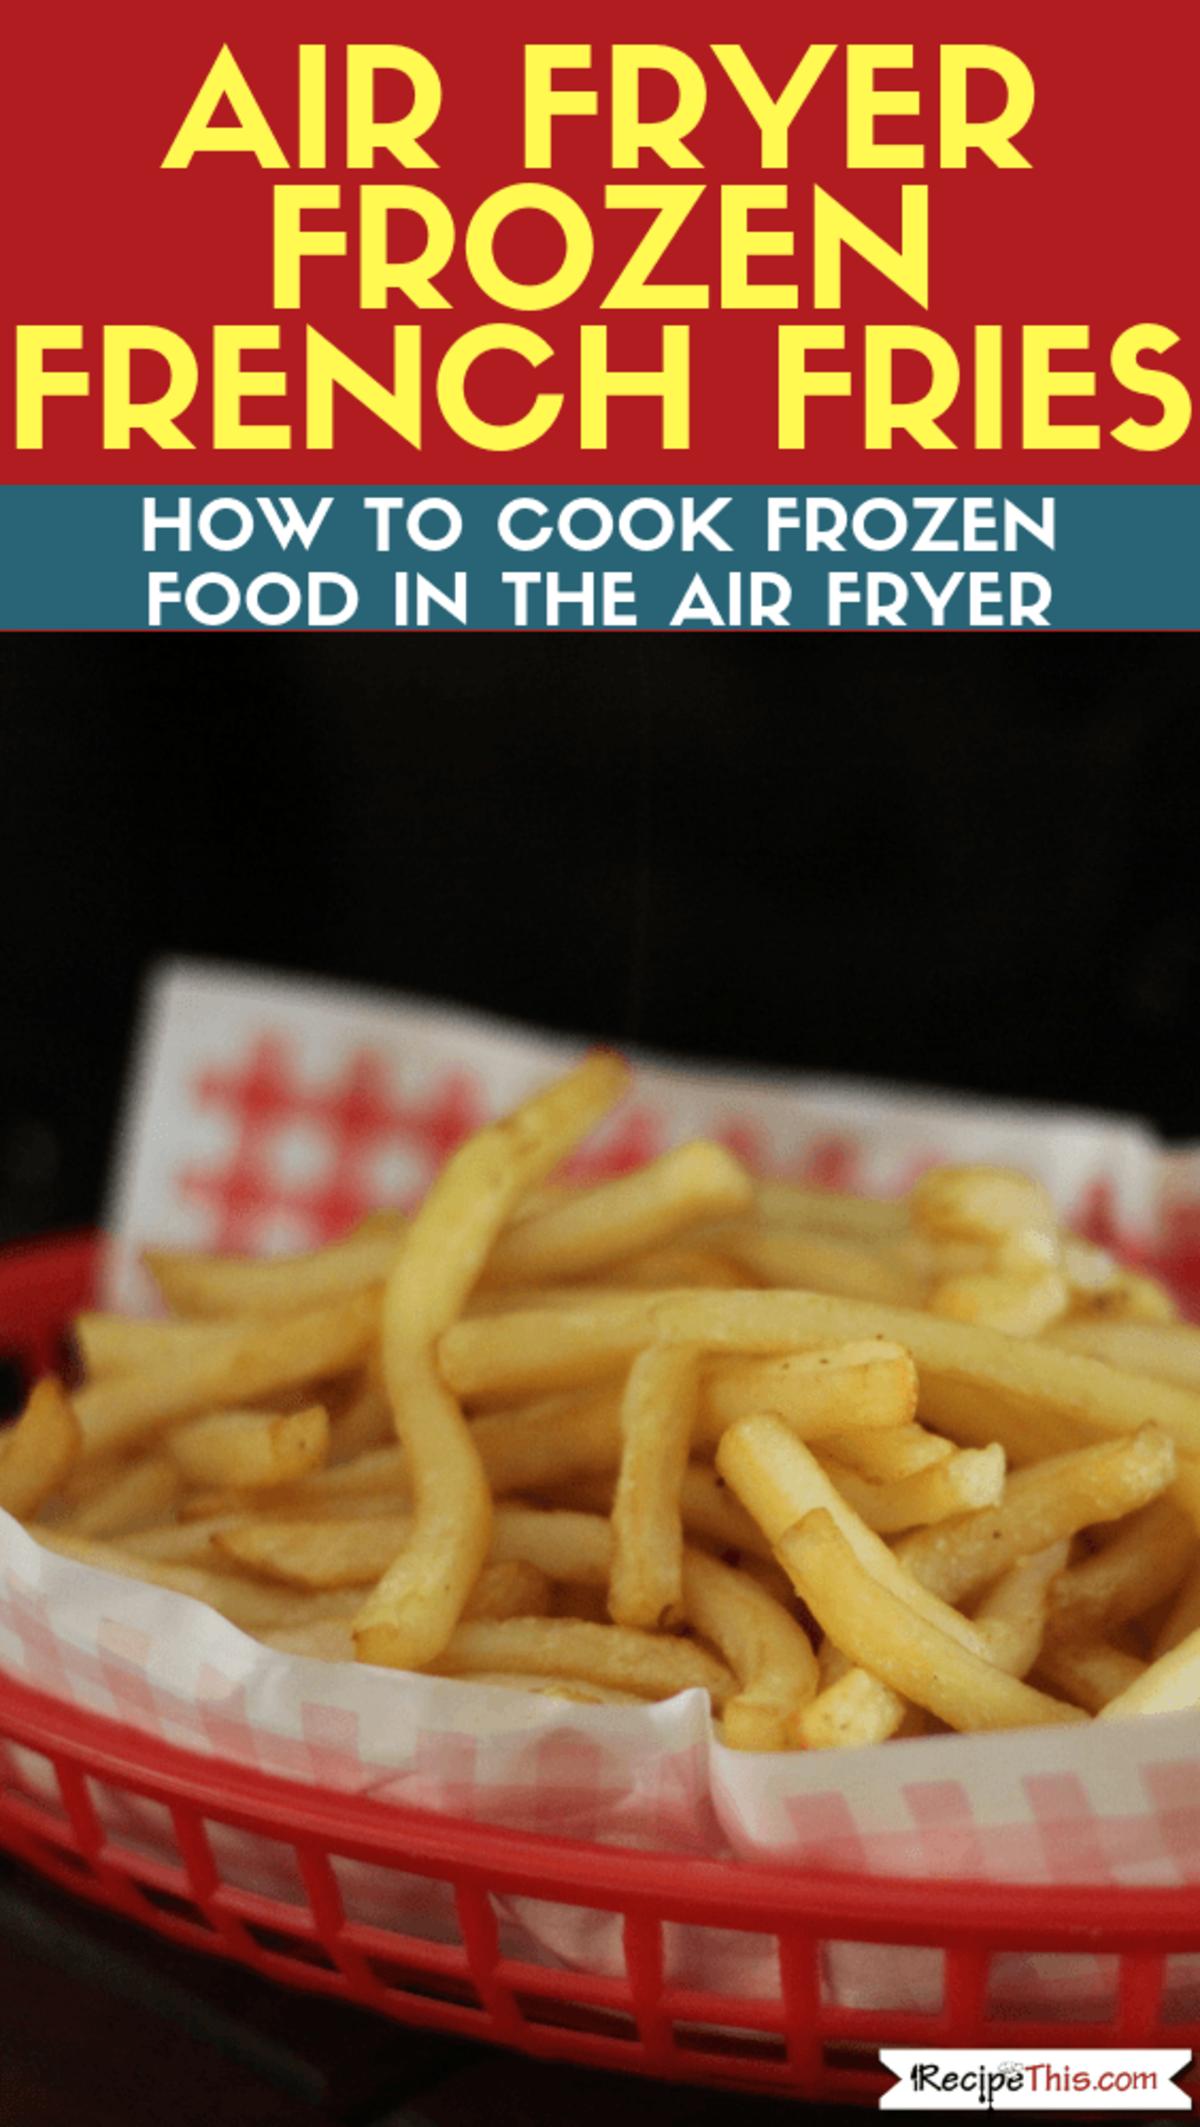 Air Fryer Frozen French Fries Air fryer recipes, Air